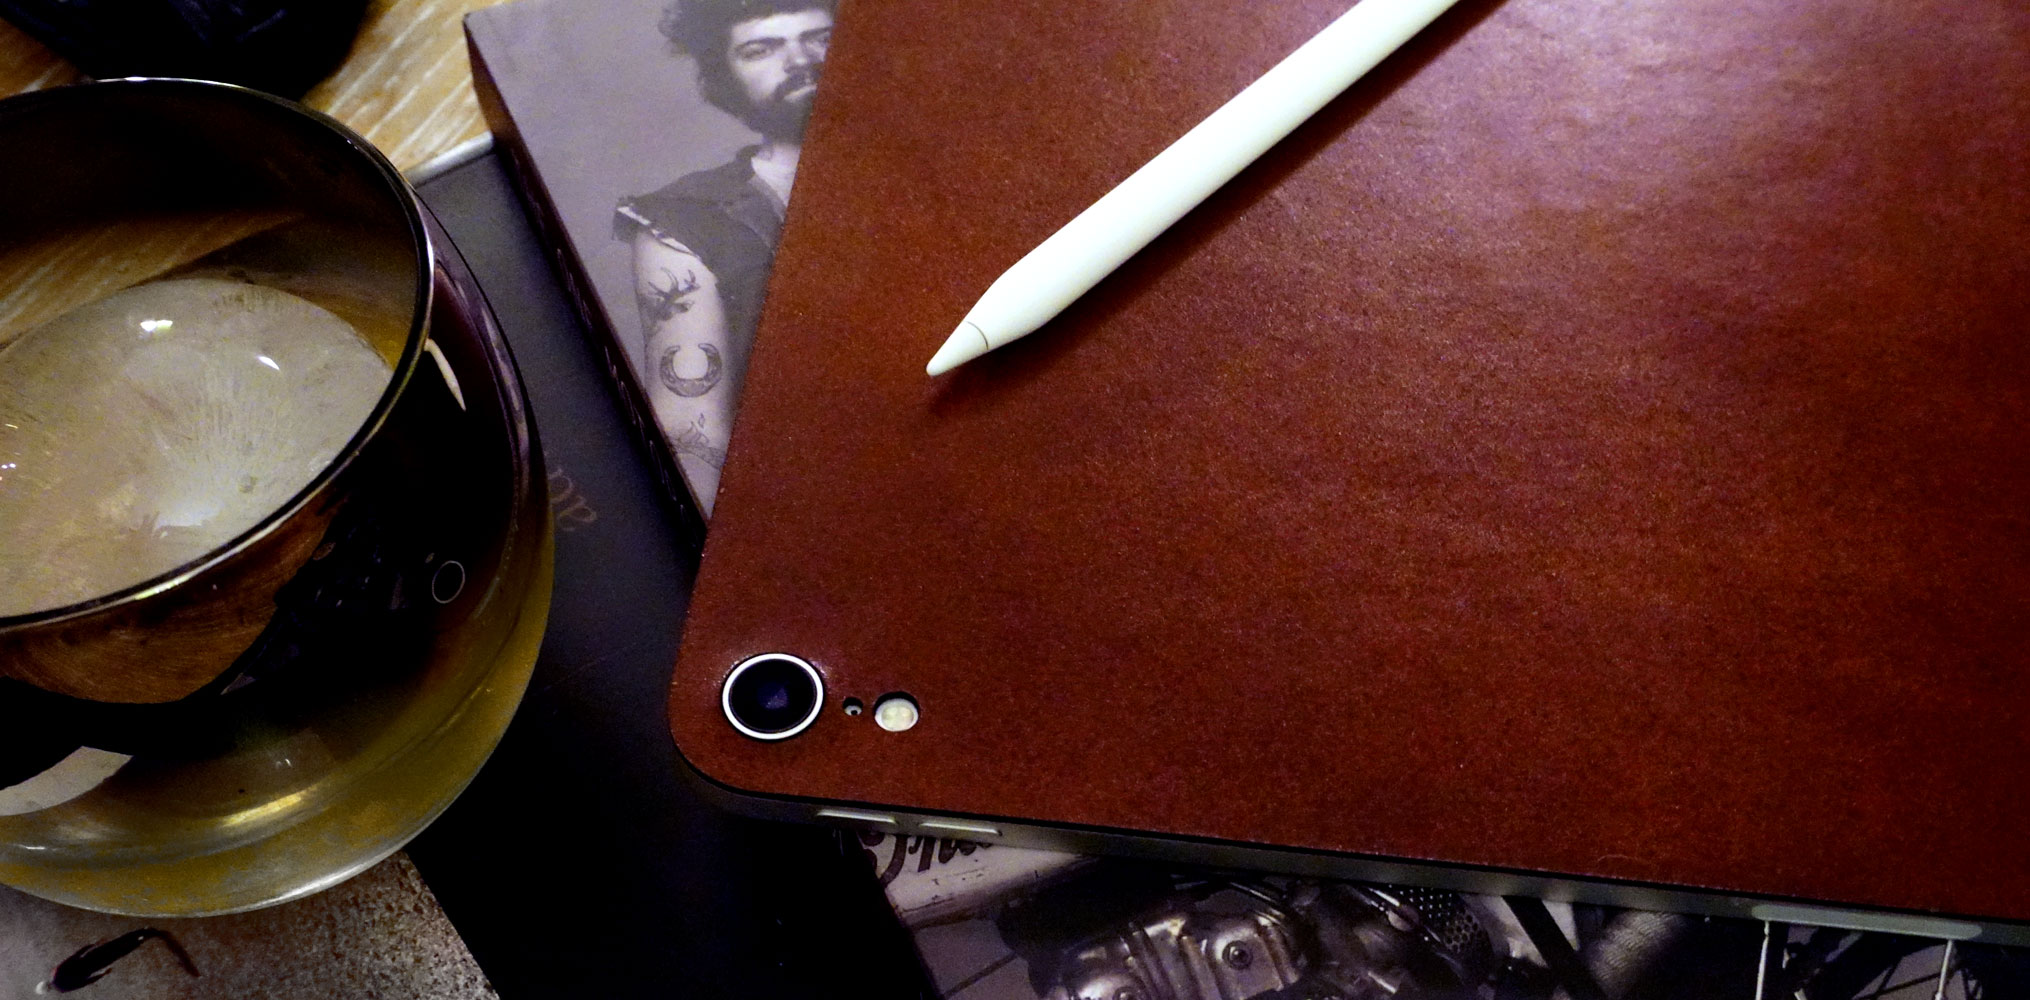 ipad-pro-12-3rd-gen-leather-moto.jpg